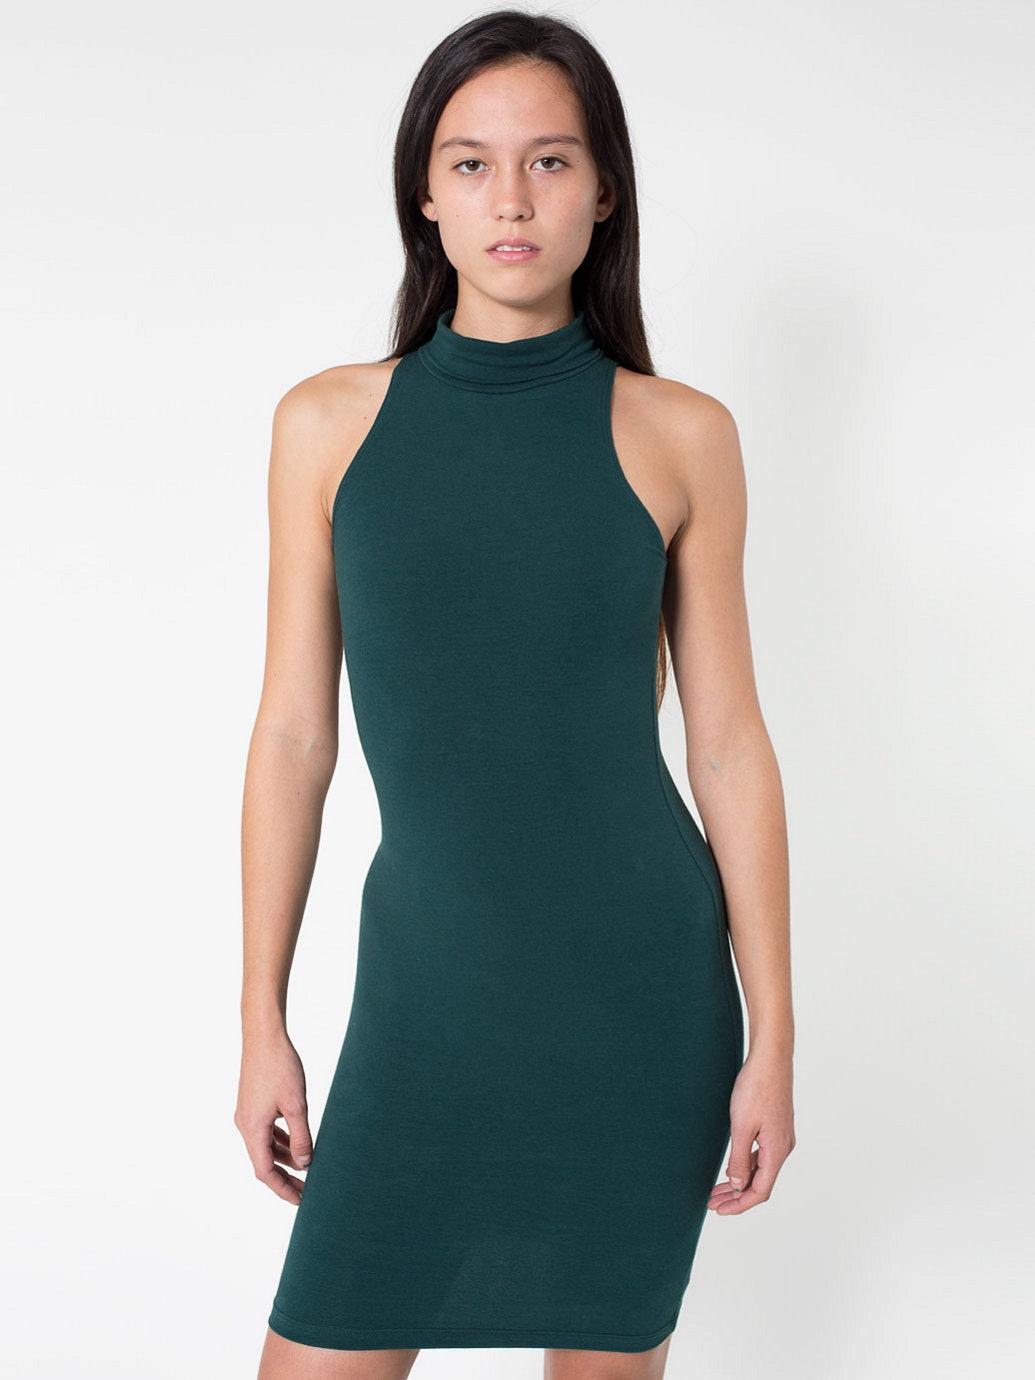 Cotton Spandex Jersey Sleeveless Turtleneck Dress | American Apparel